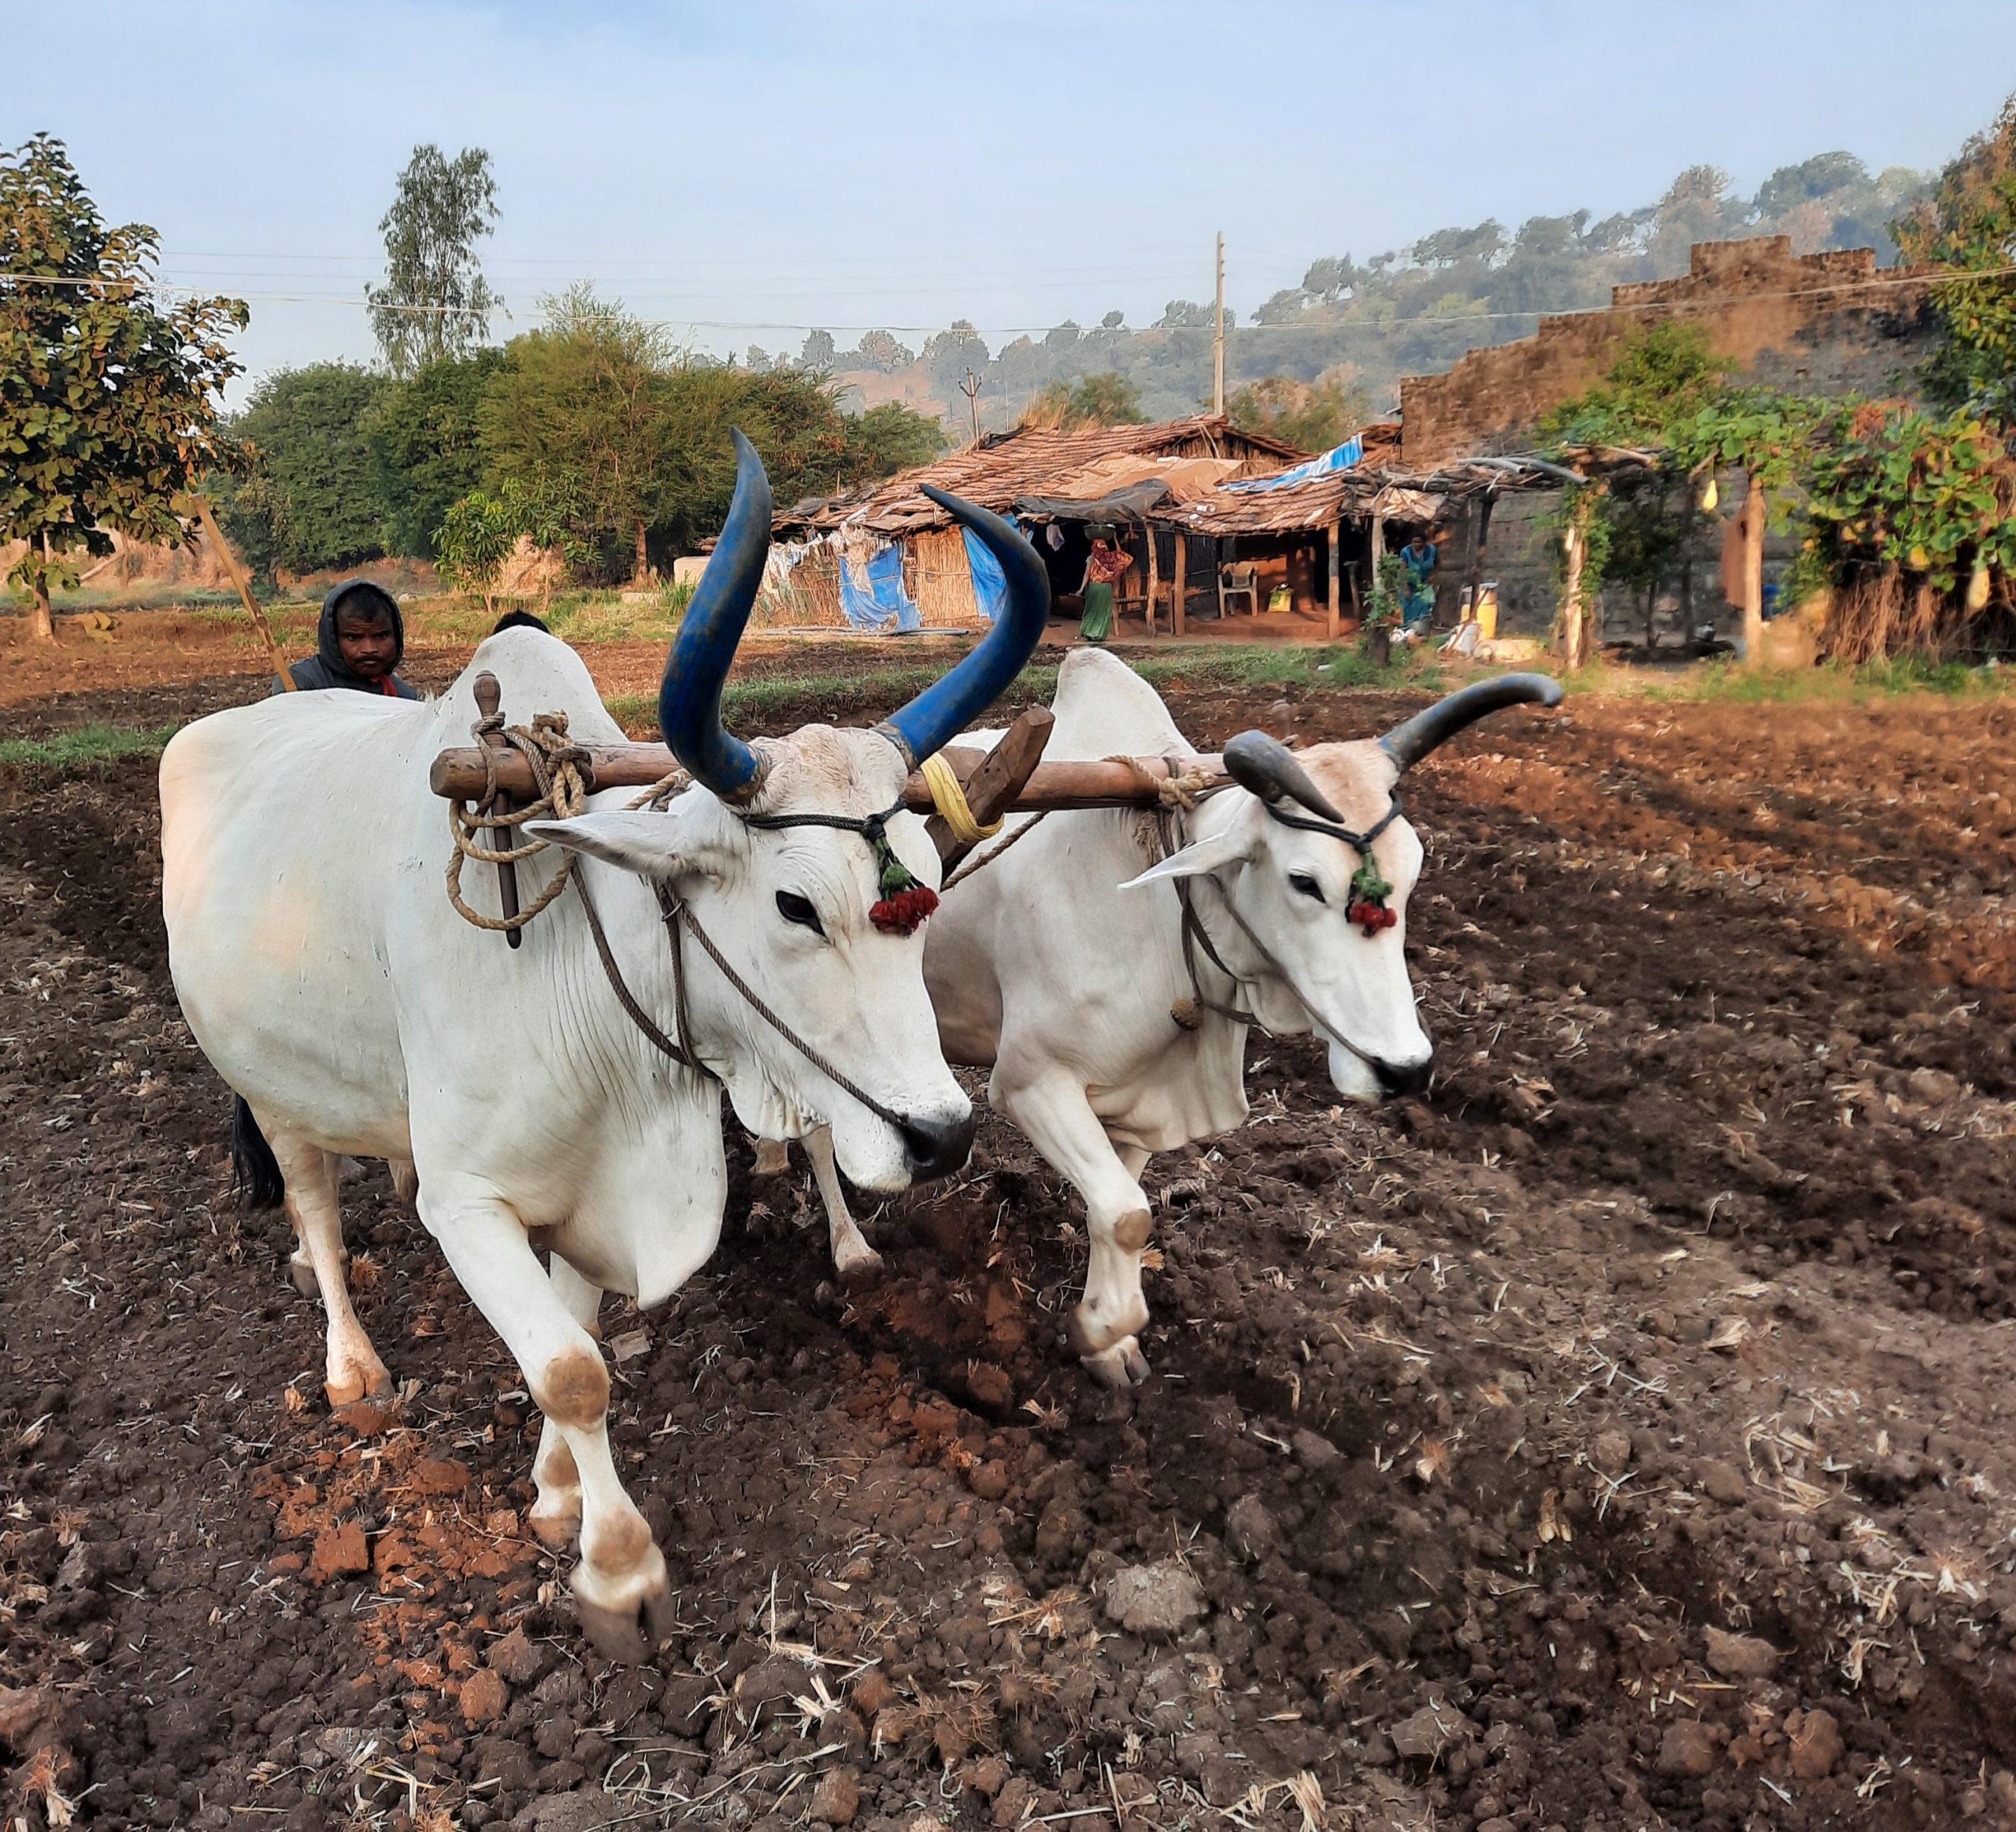 A Farmer cultivating field